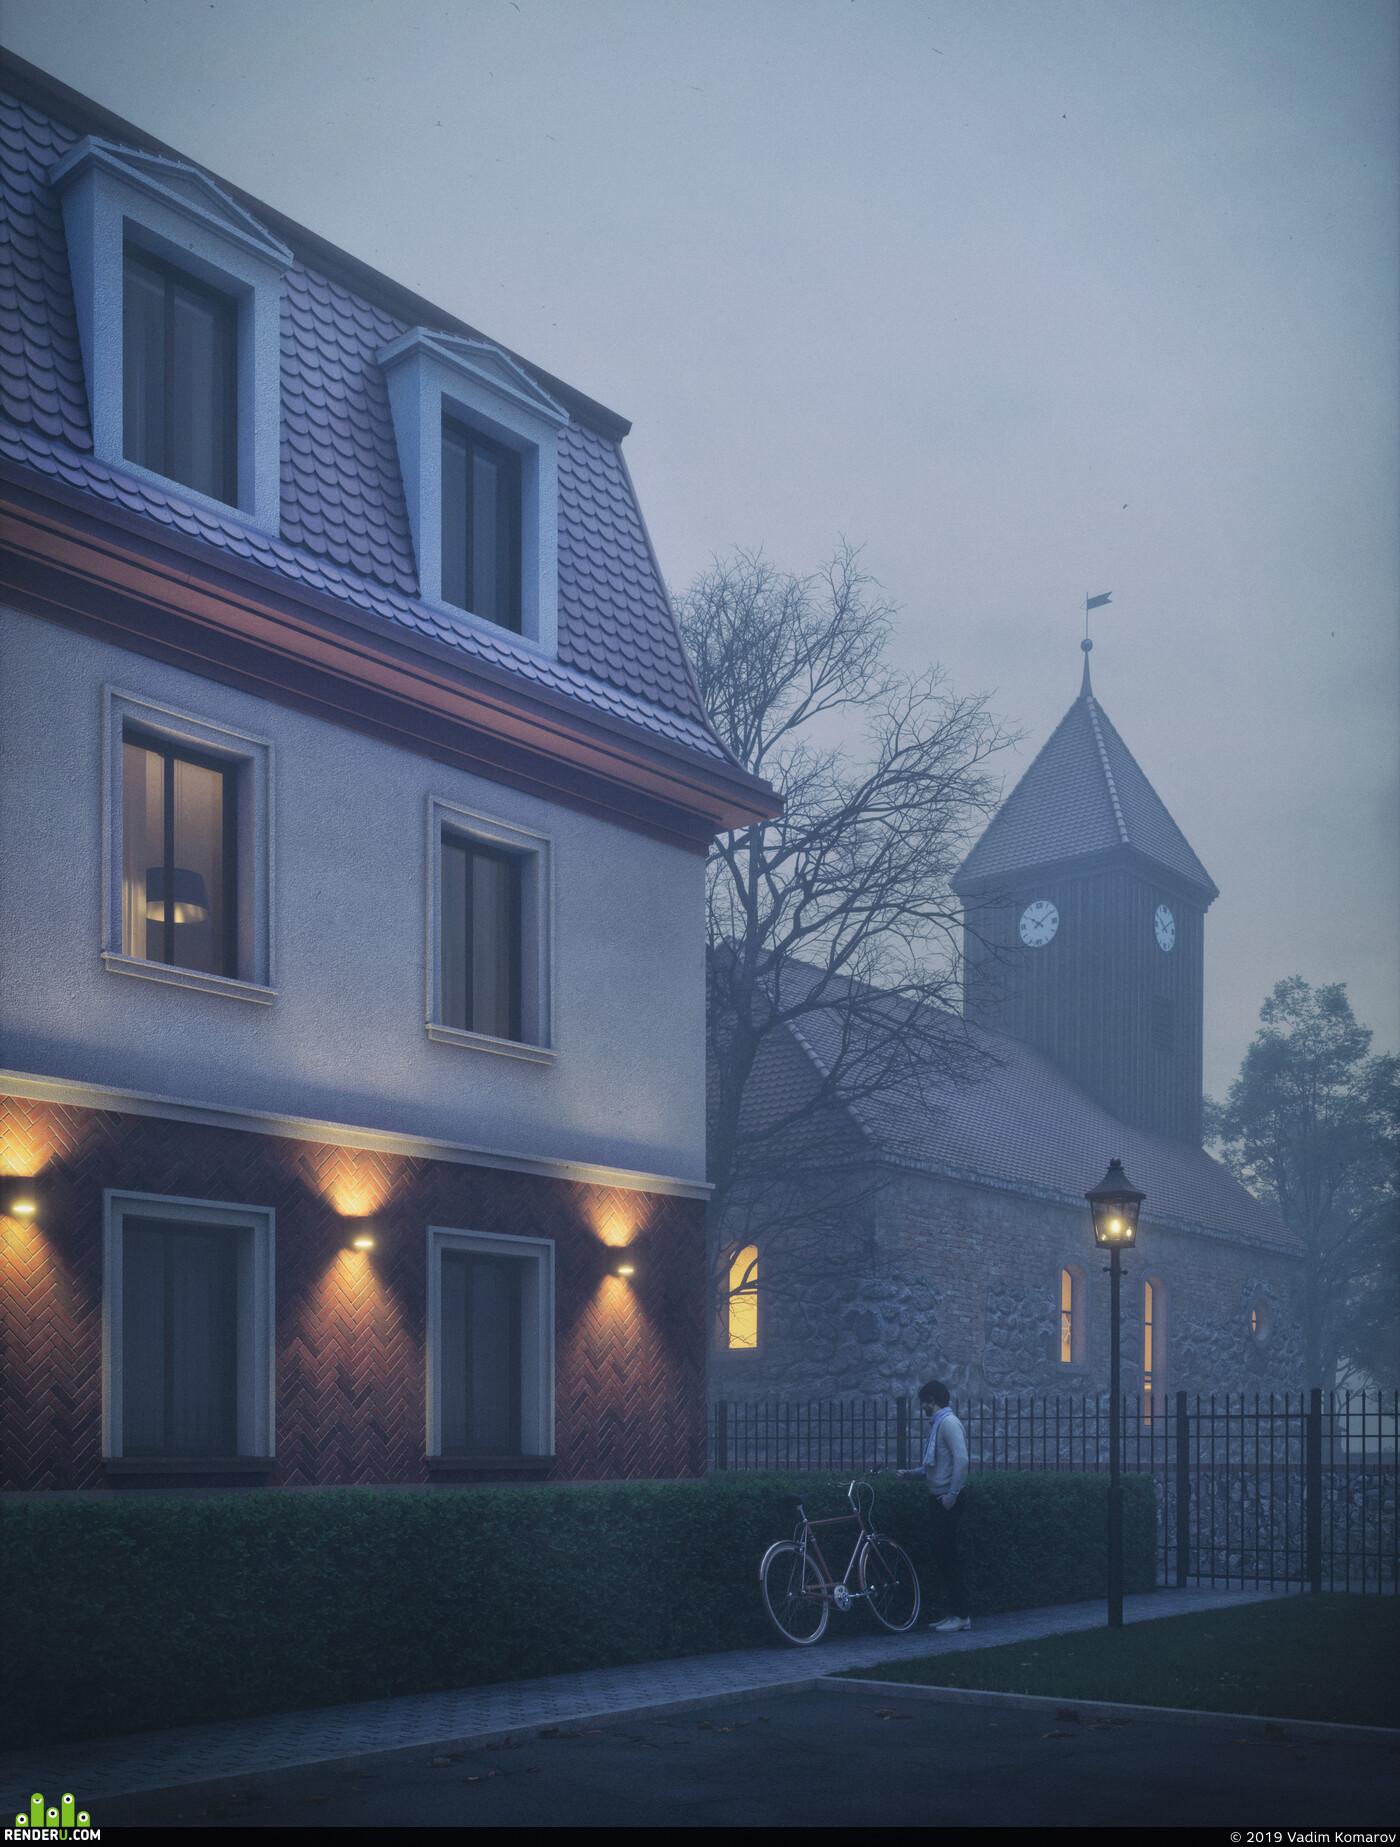 Cinema 4D, visualisation, Exterior, Architecture, cgi, rendering, render, Octane Render, octane, 3d vis